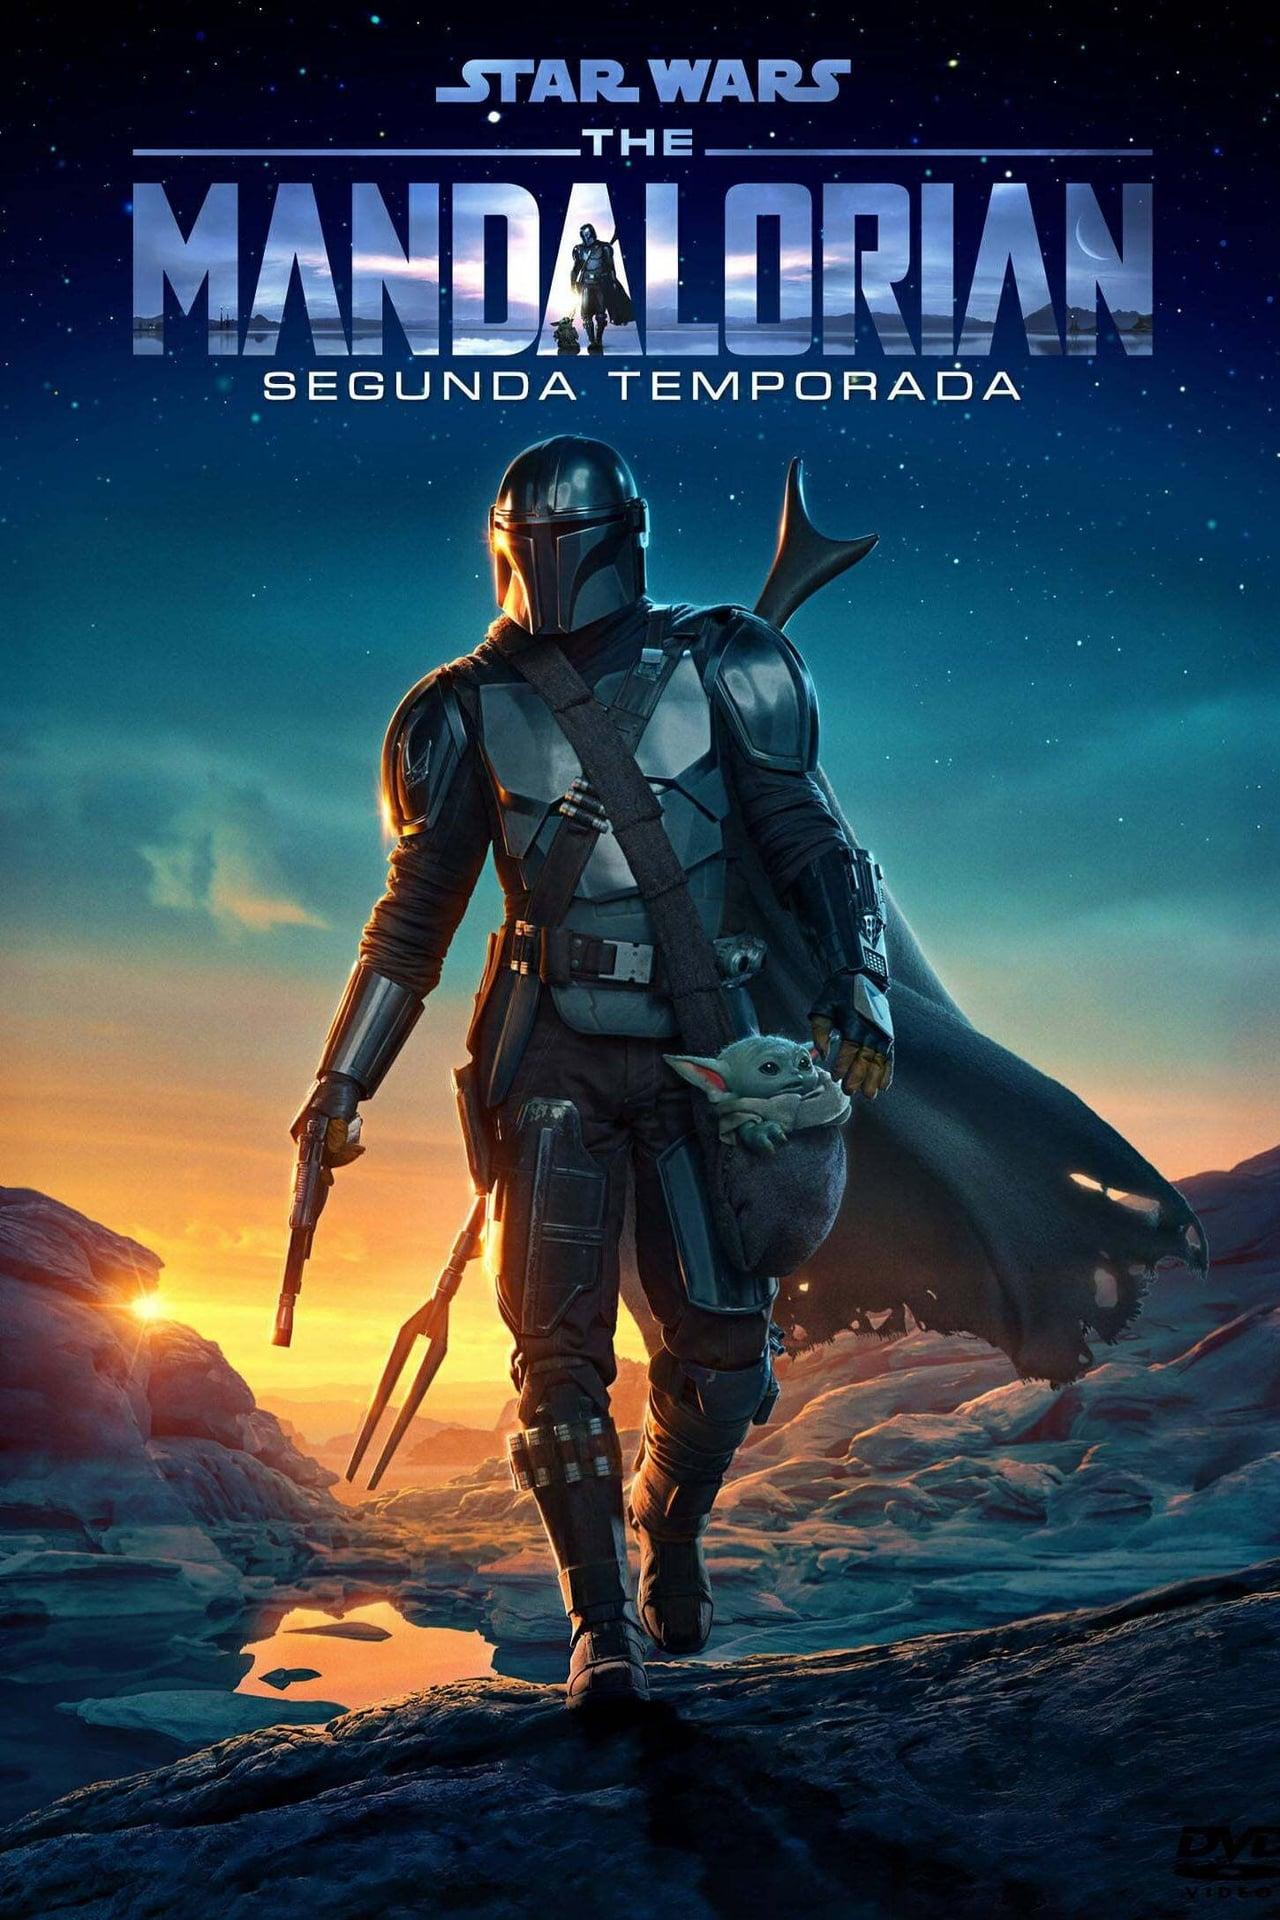 The Mandalorian - Season 1 Episode 4 : El santuario